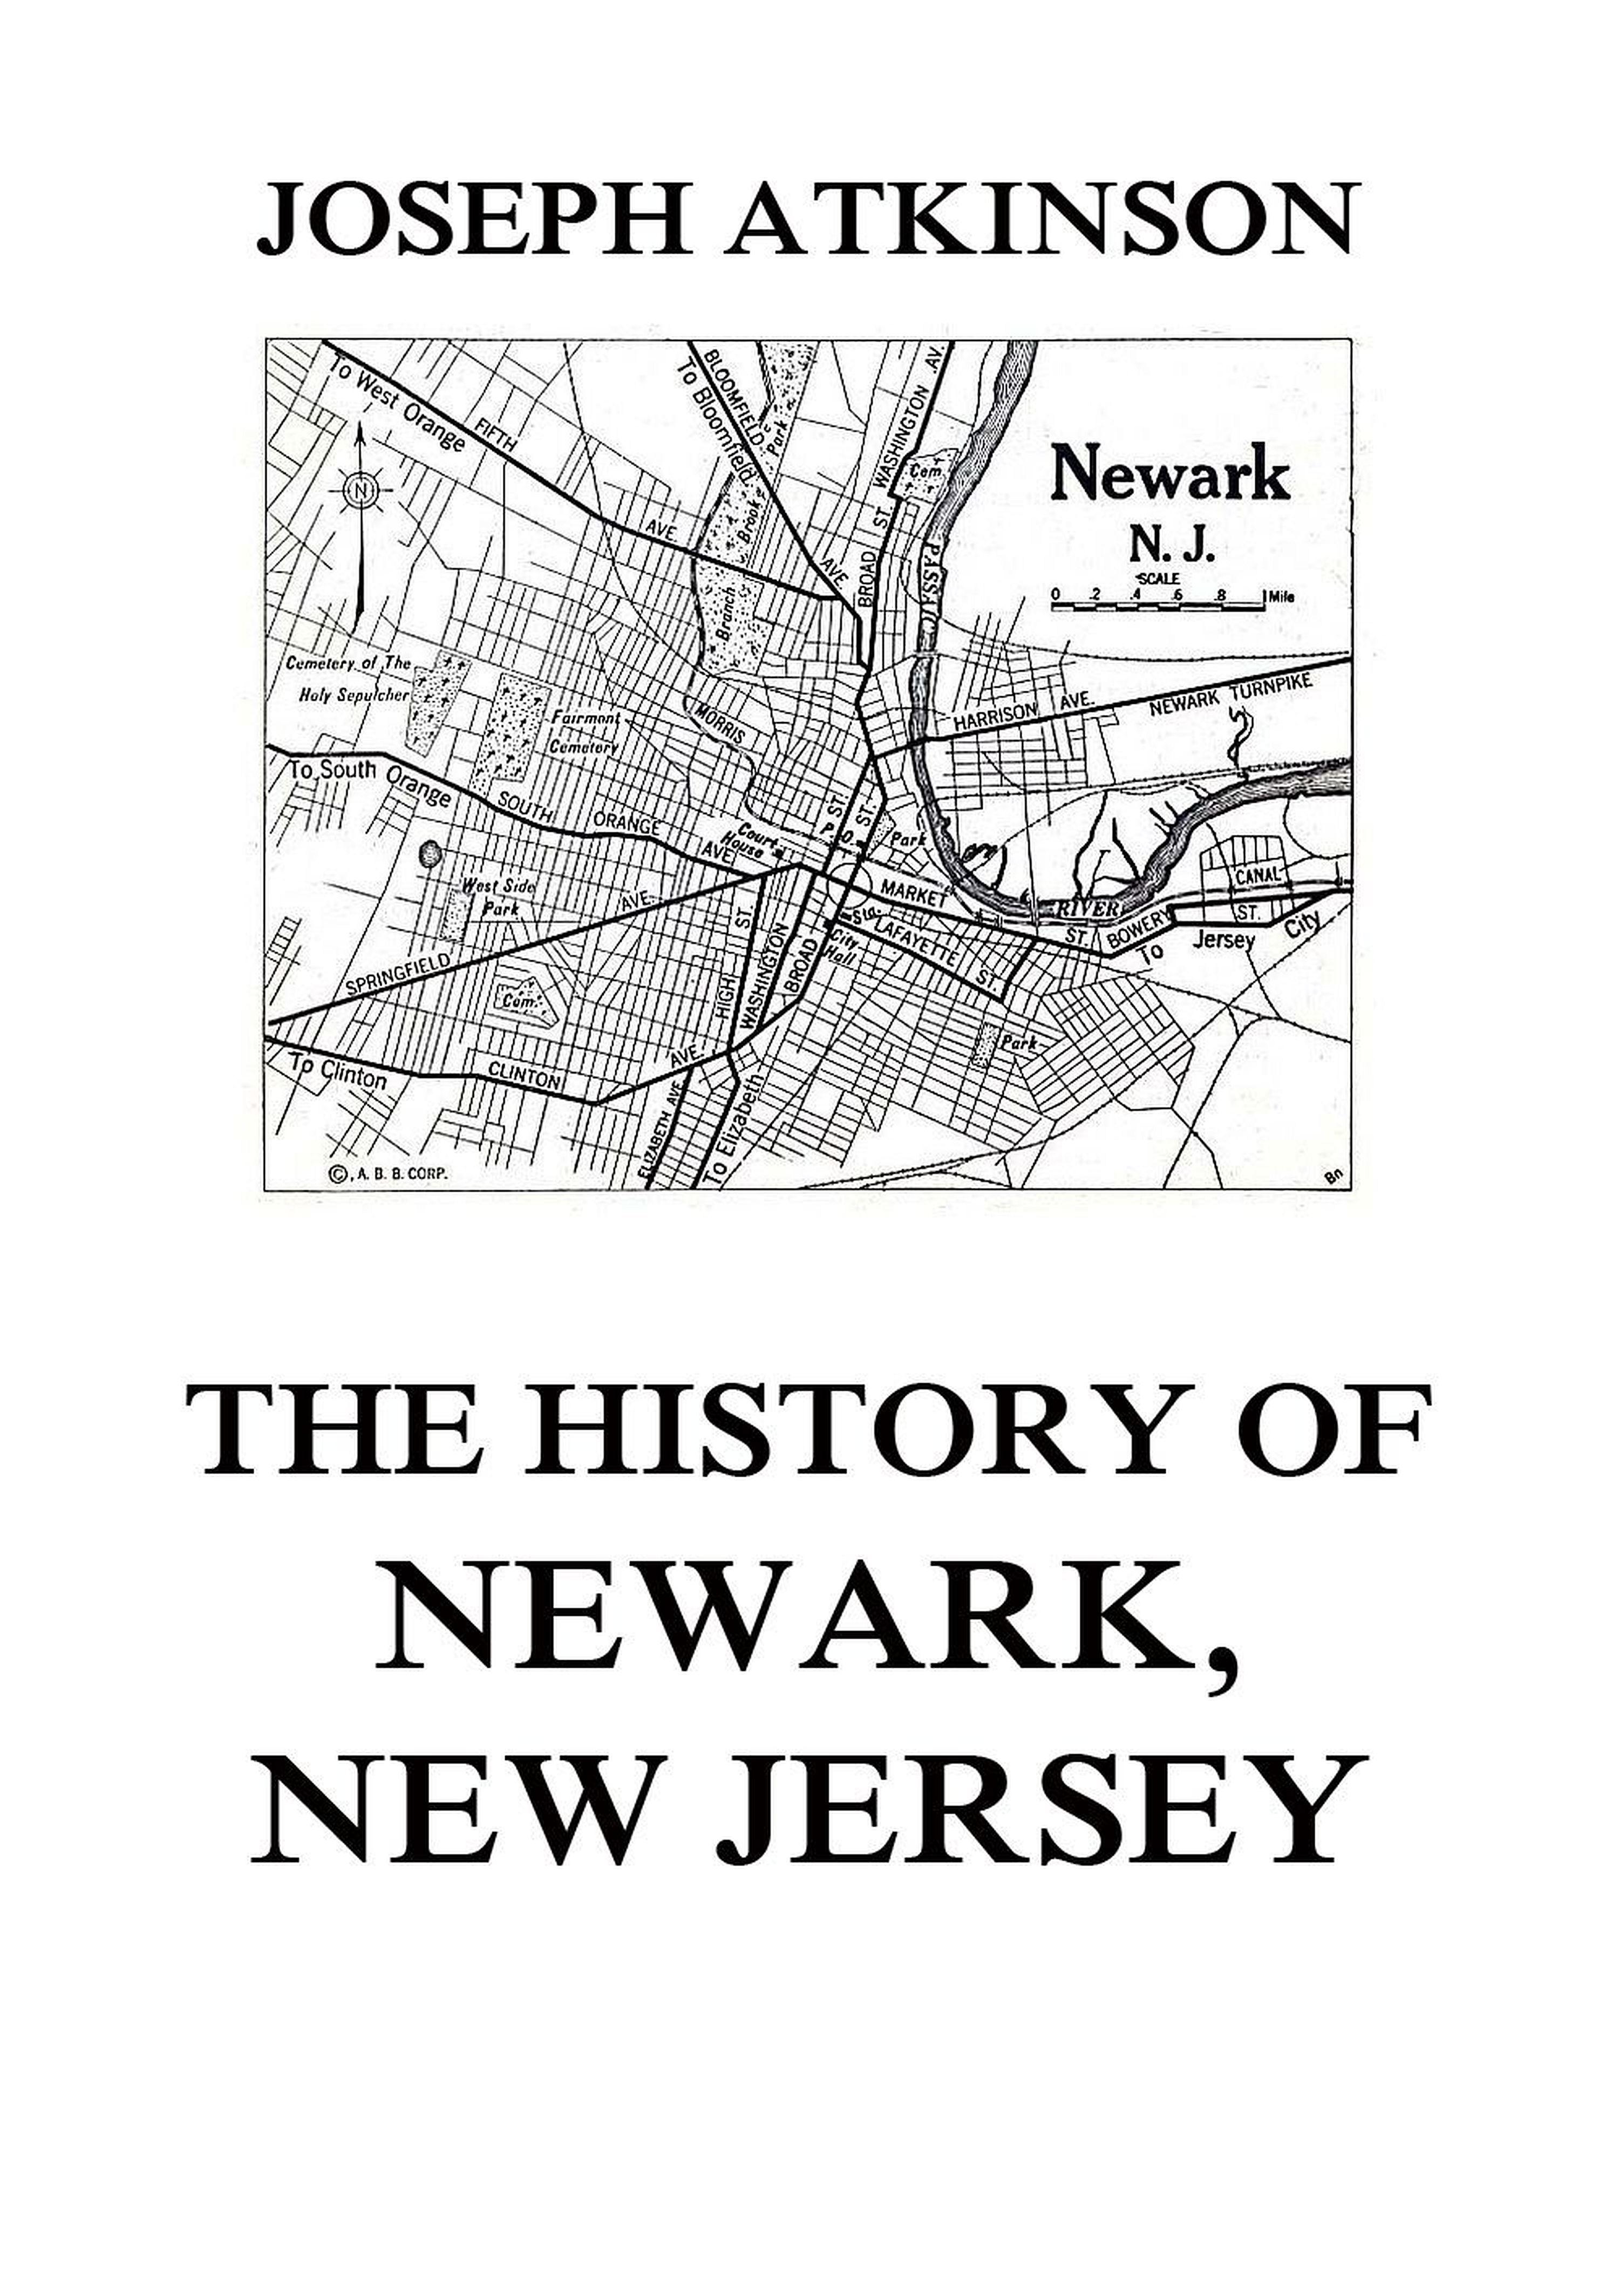 Joseph Atkinson The History of Newark, New Jersey